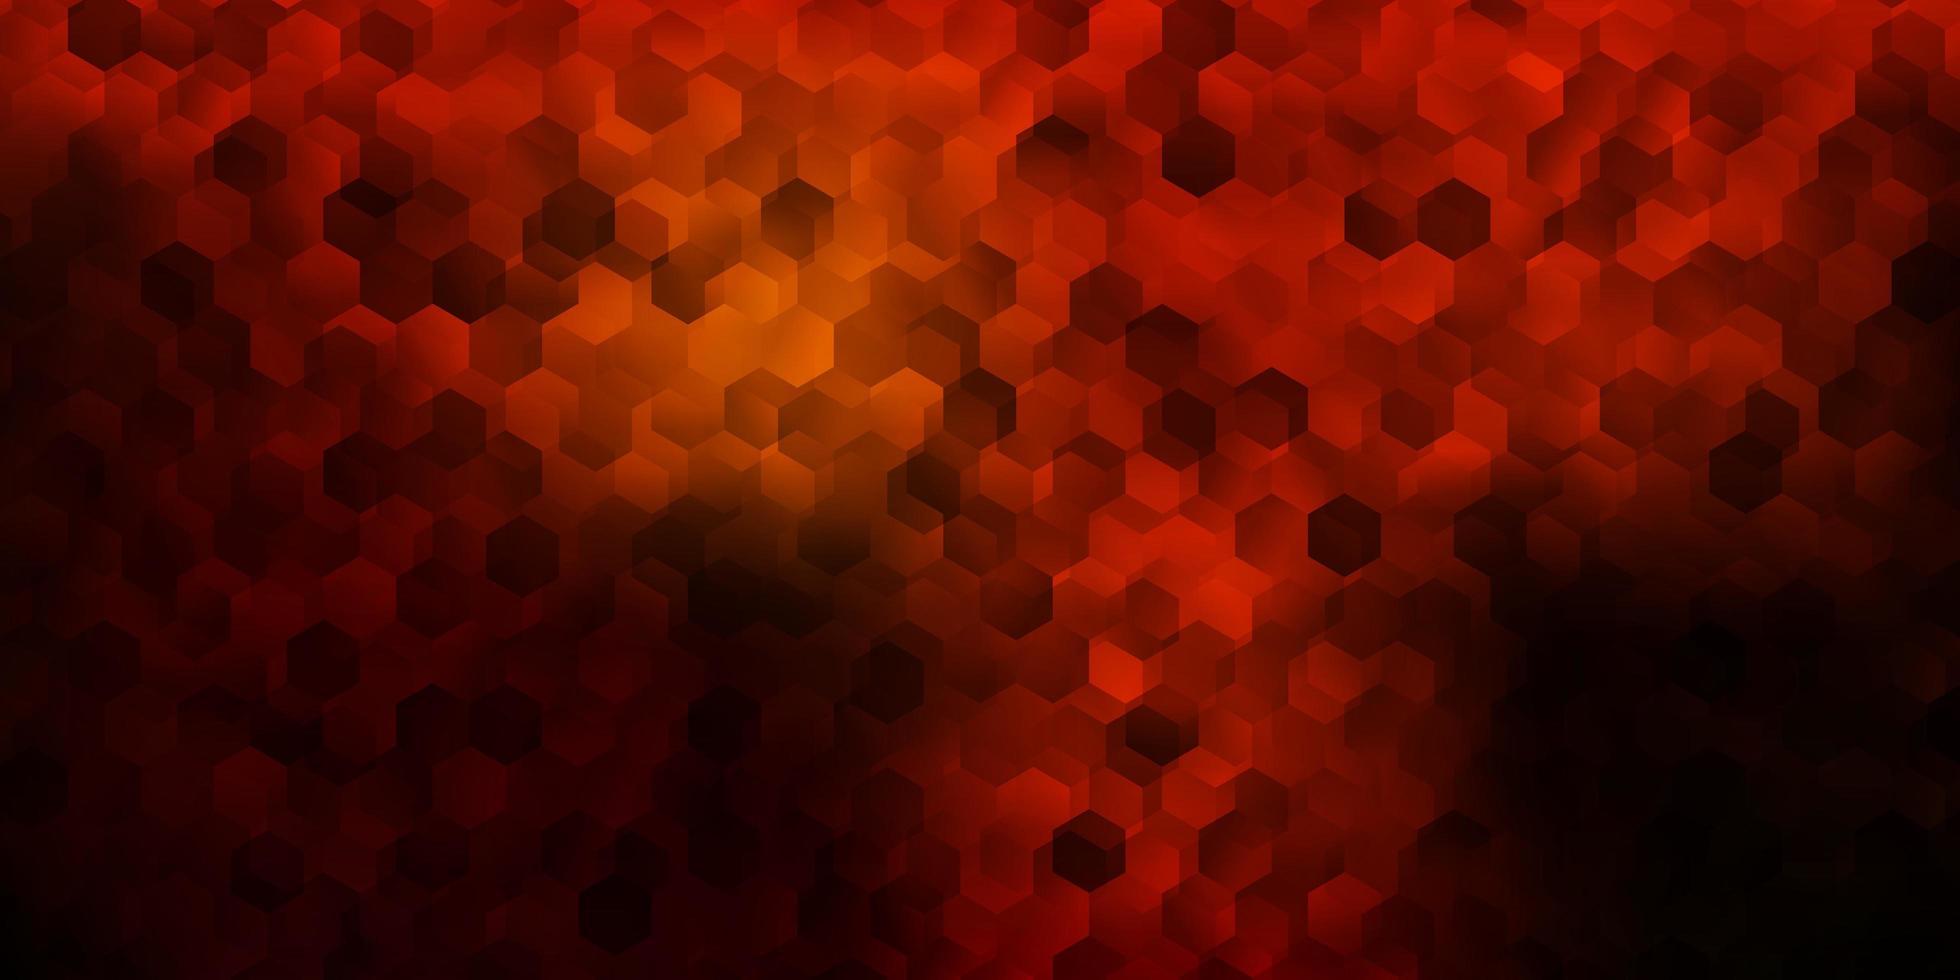 capa de vetor rosa escuro com hexágonos simples.